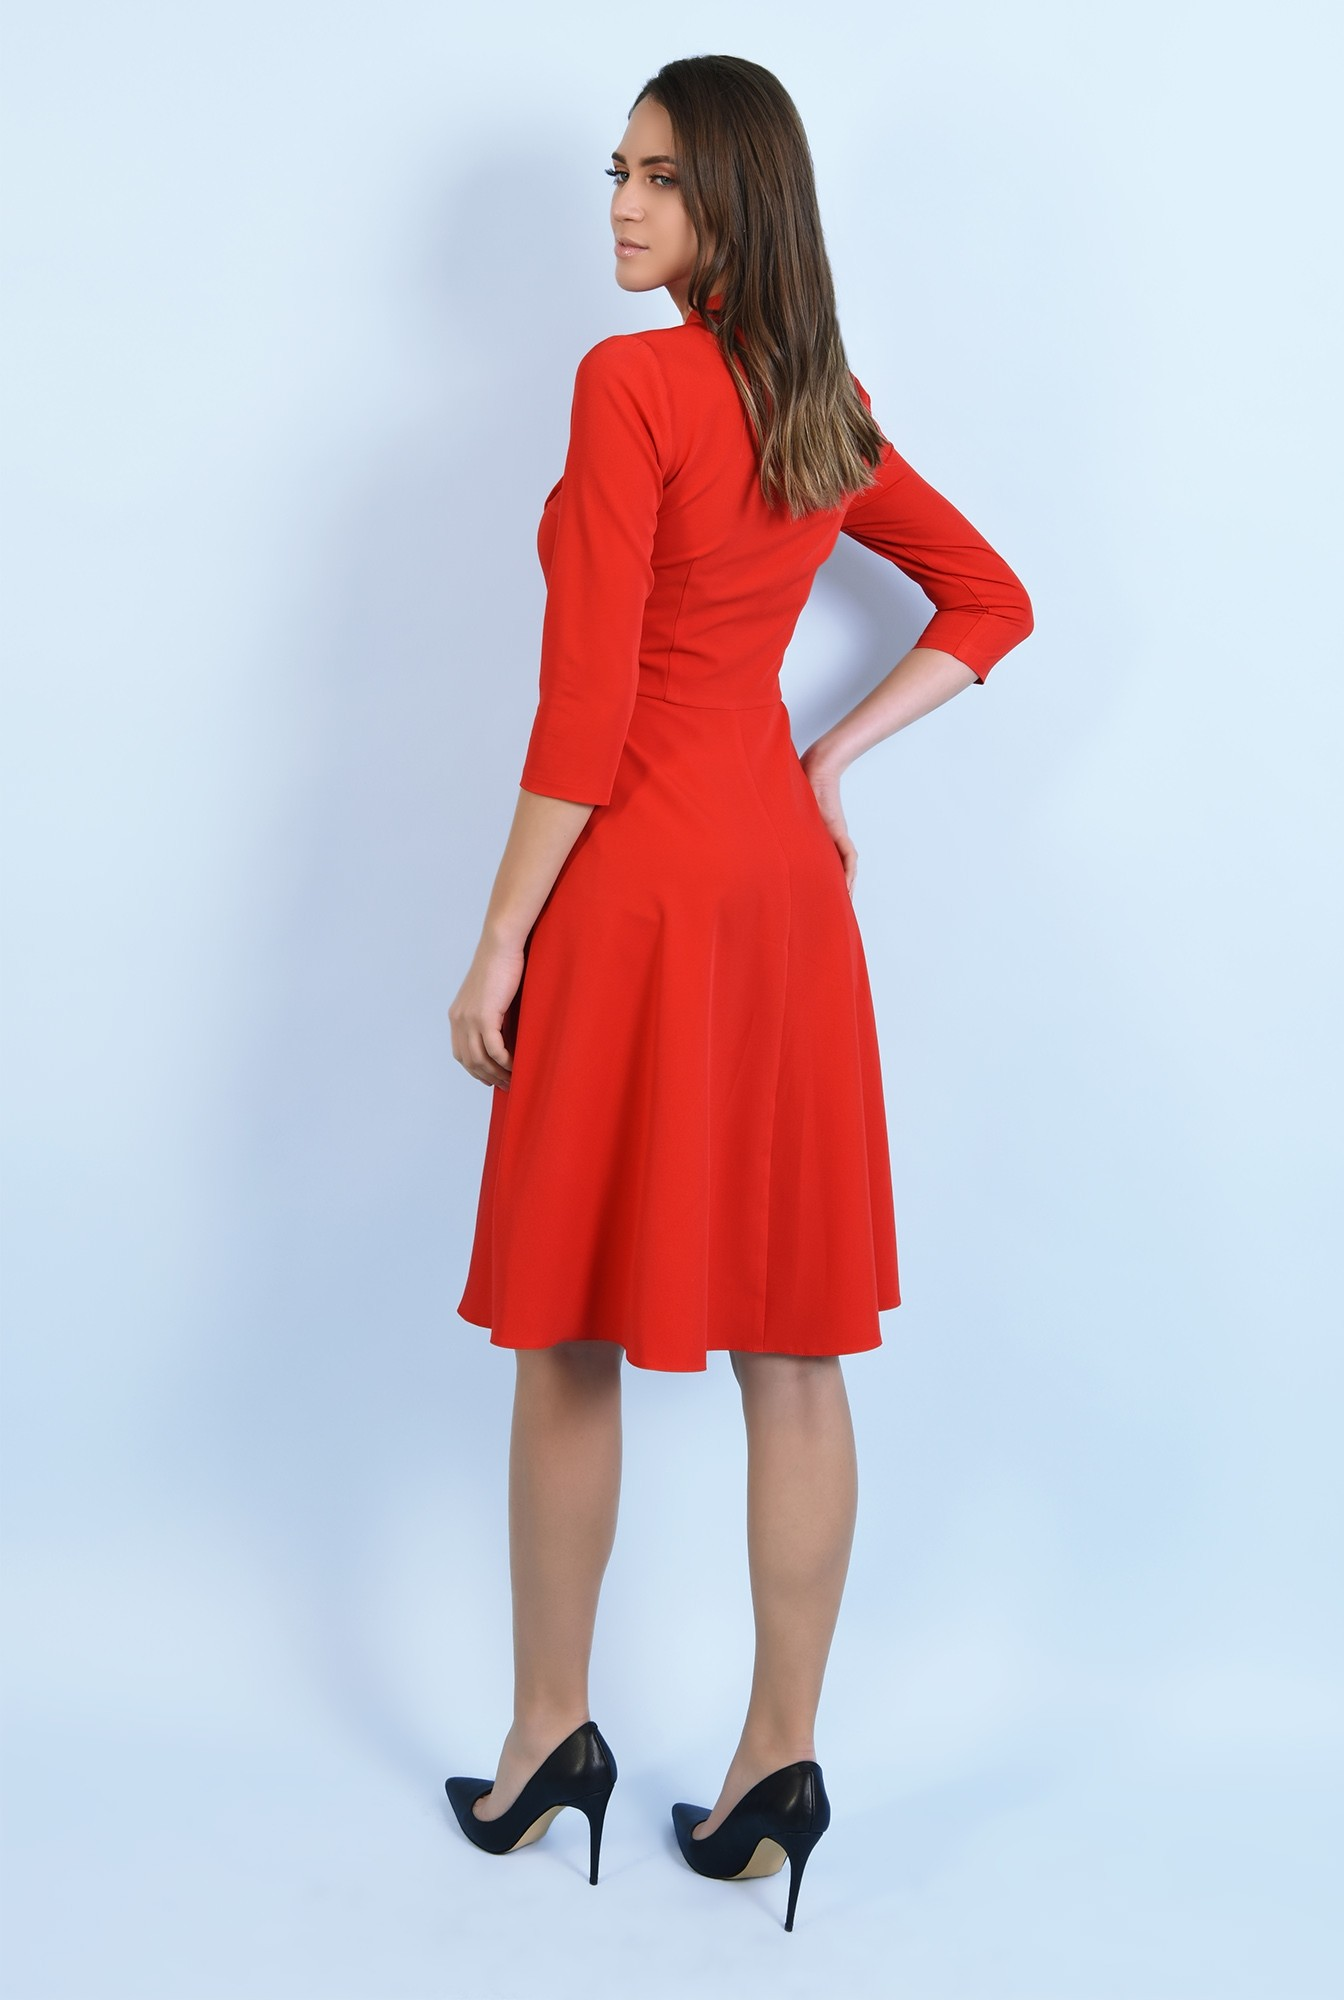 1 - rochie rosie, casual, midi, evazata, cu funda, Poema